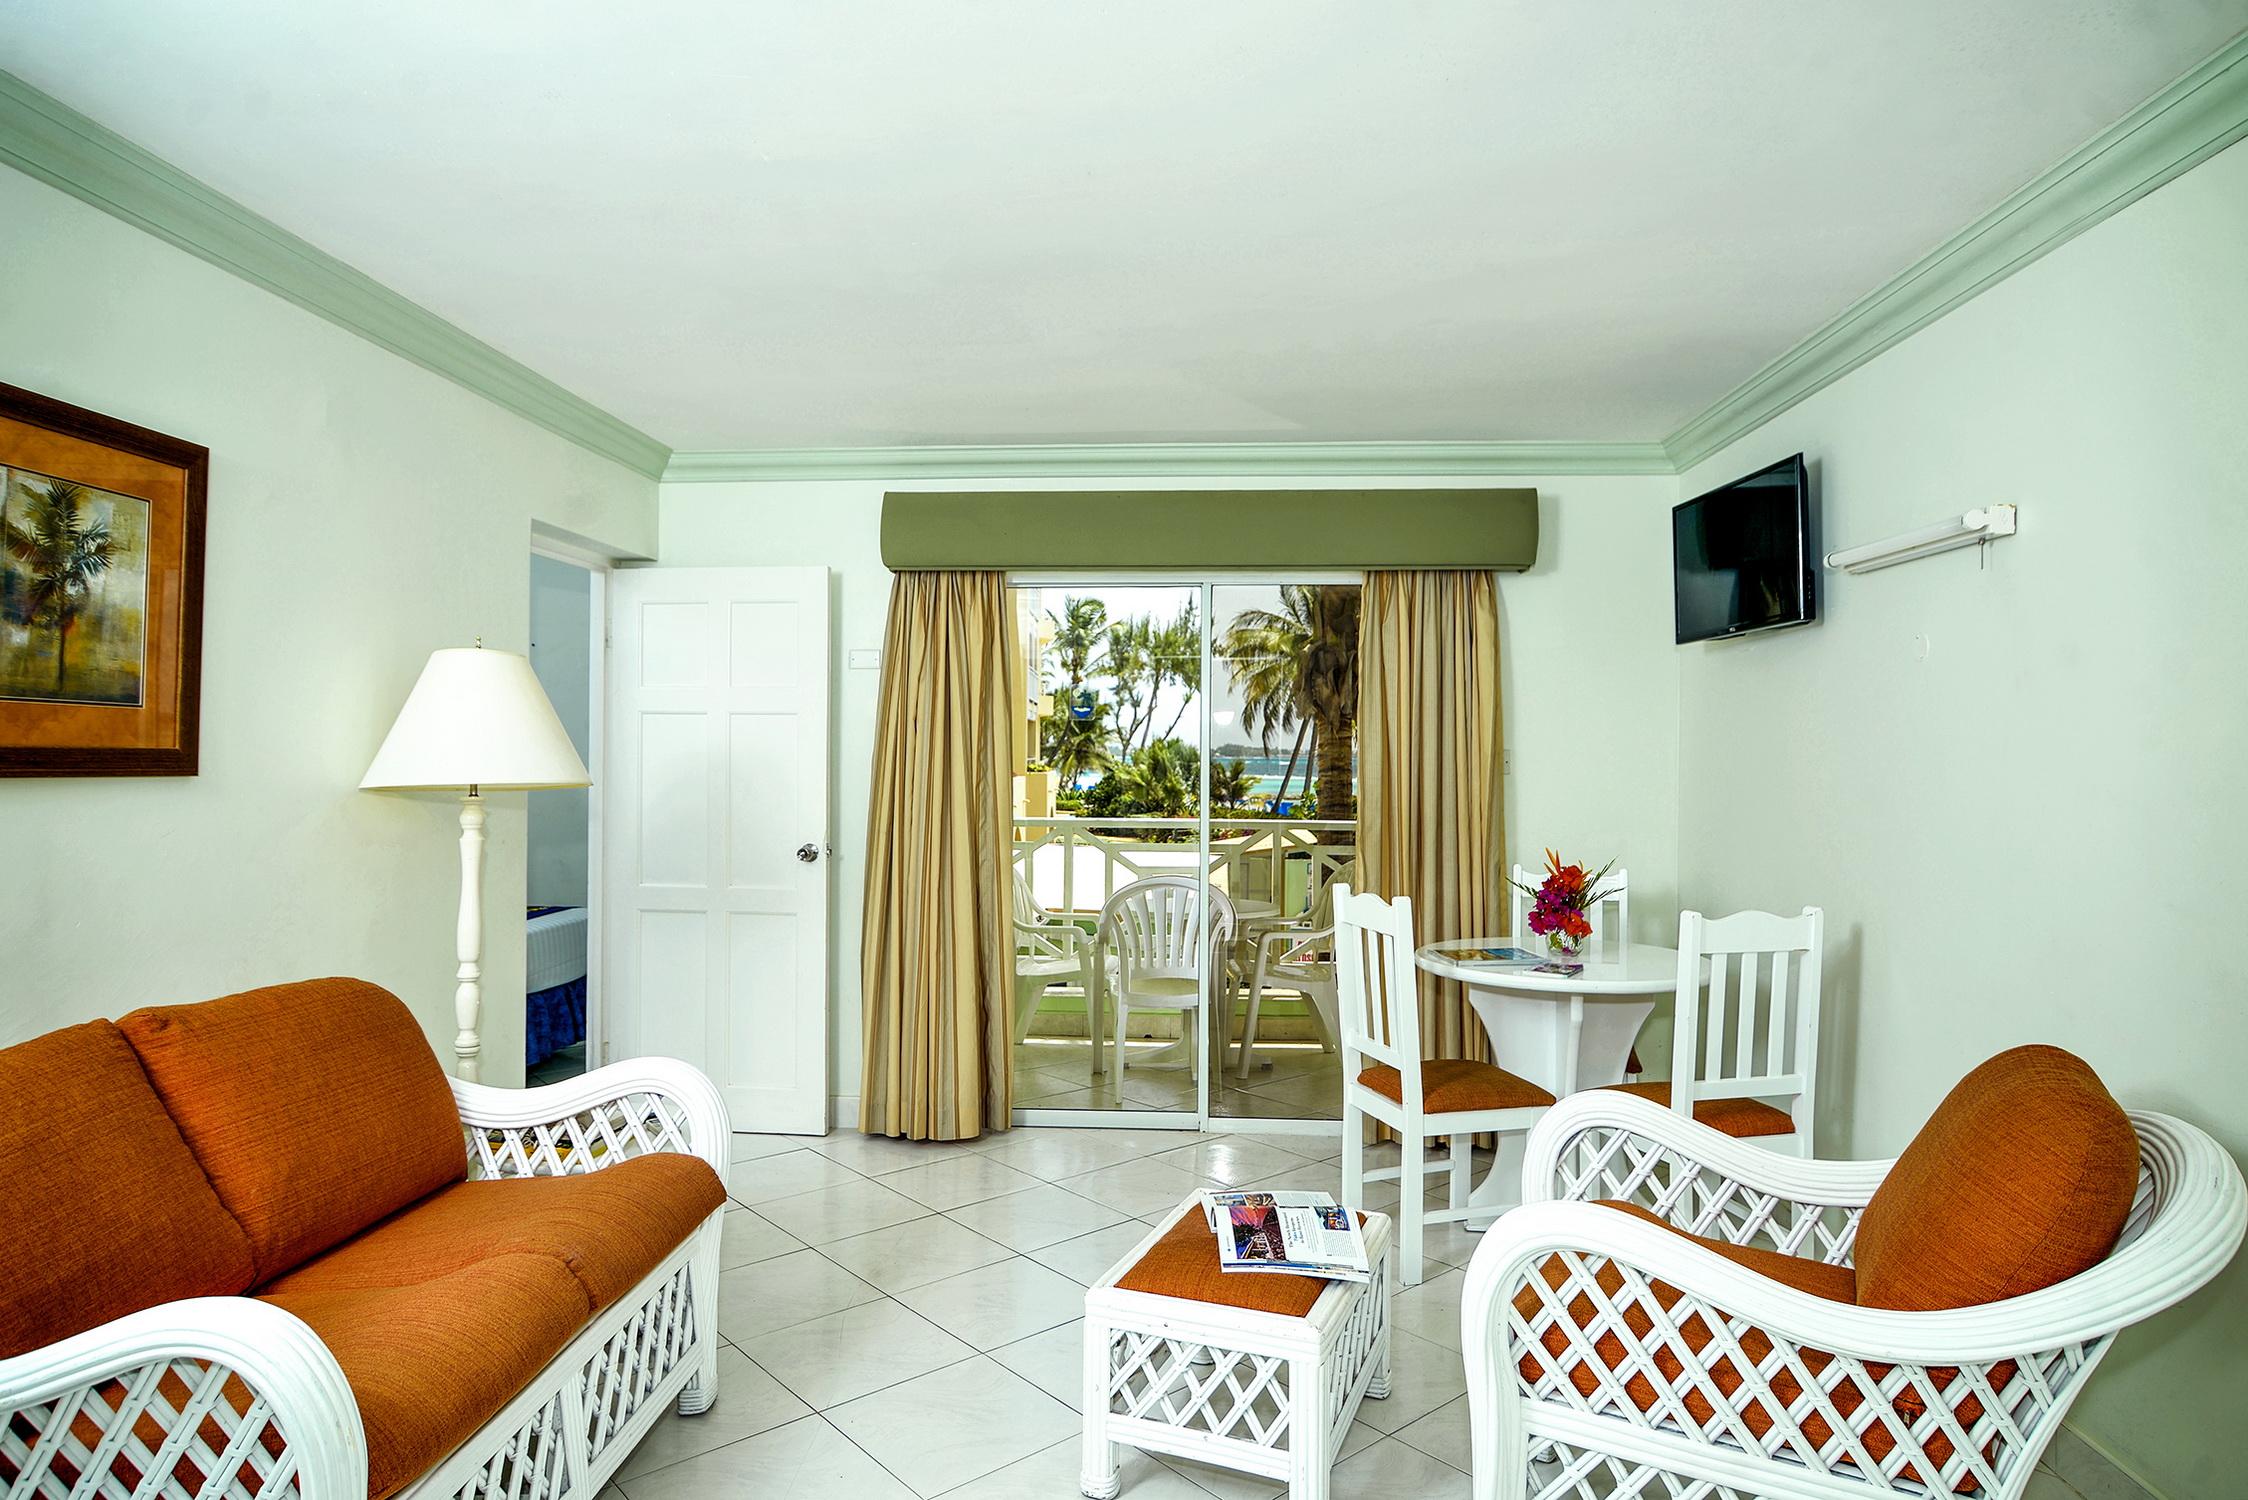 02-one-bedroom-ocean-view-3_resize